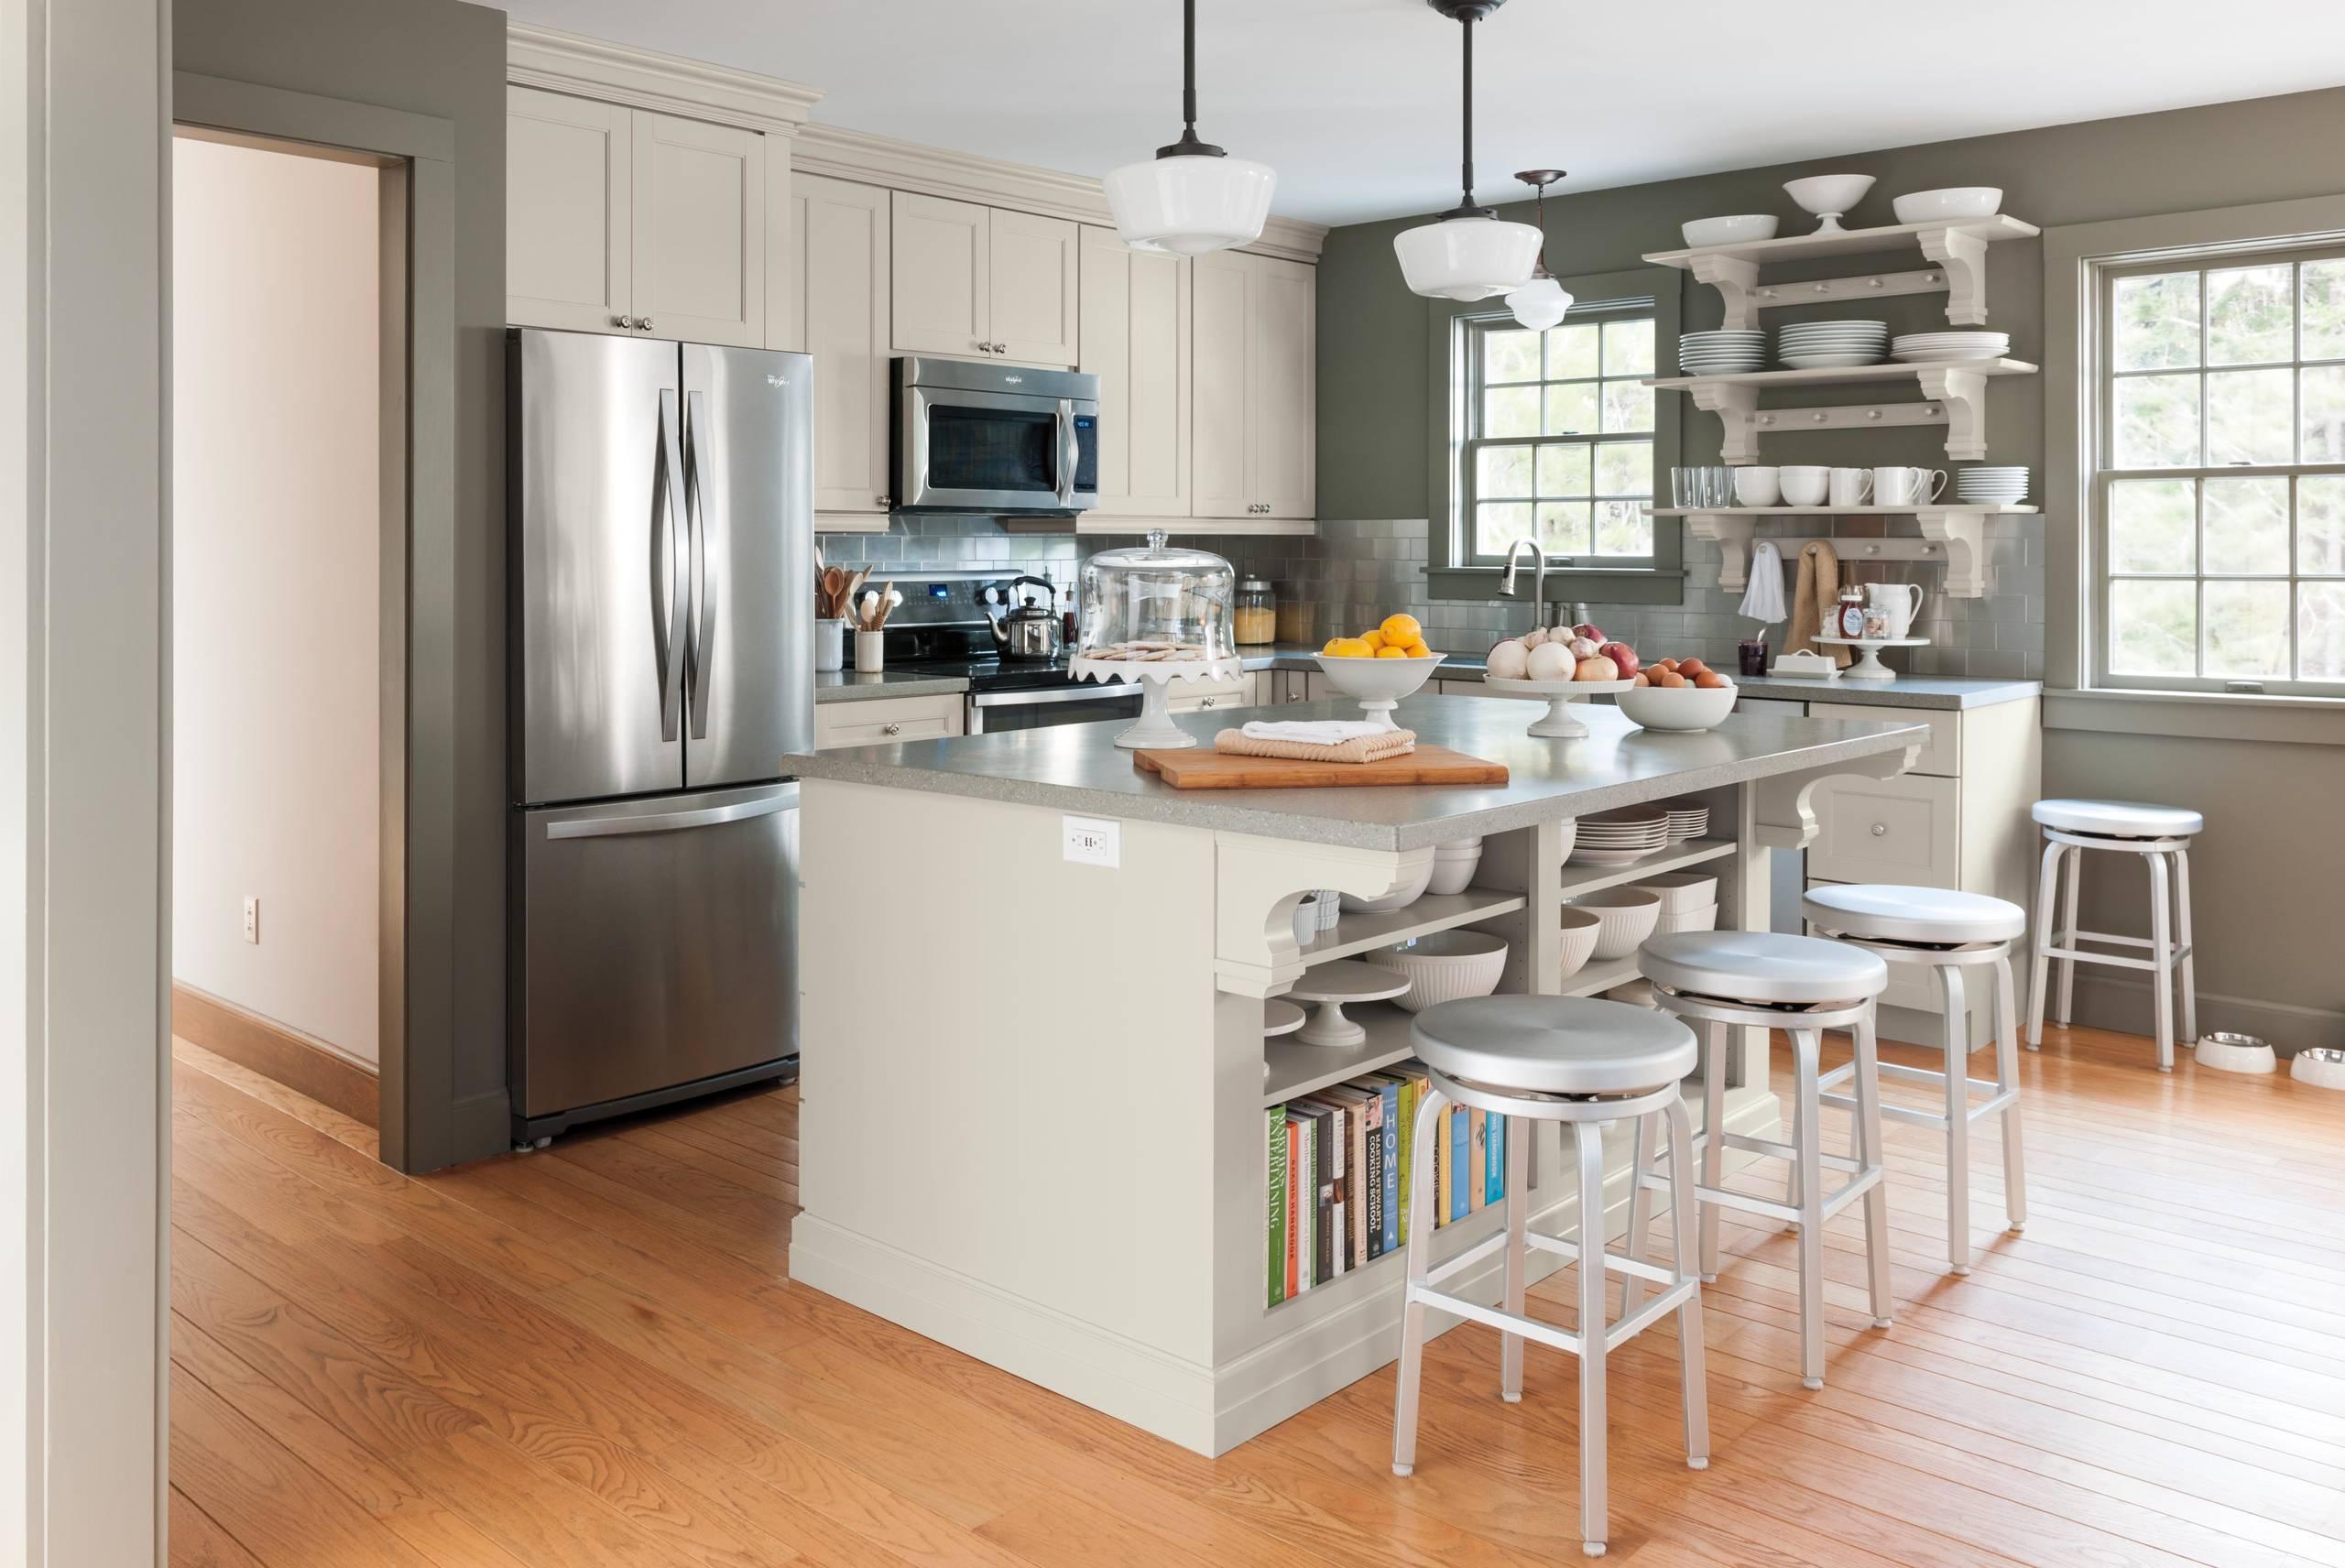 Martha Sharkey Gray Kitchen